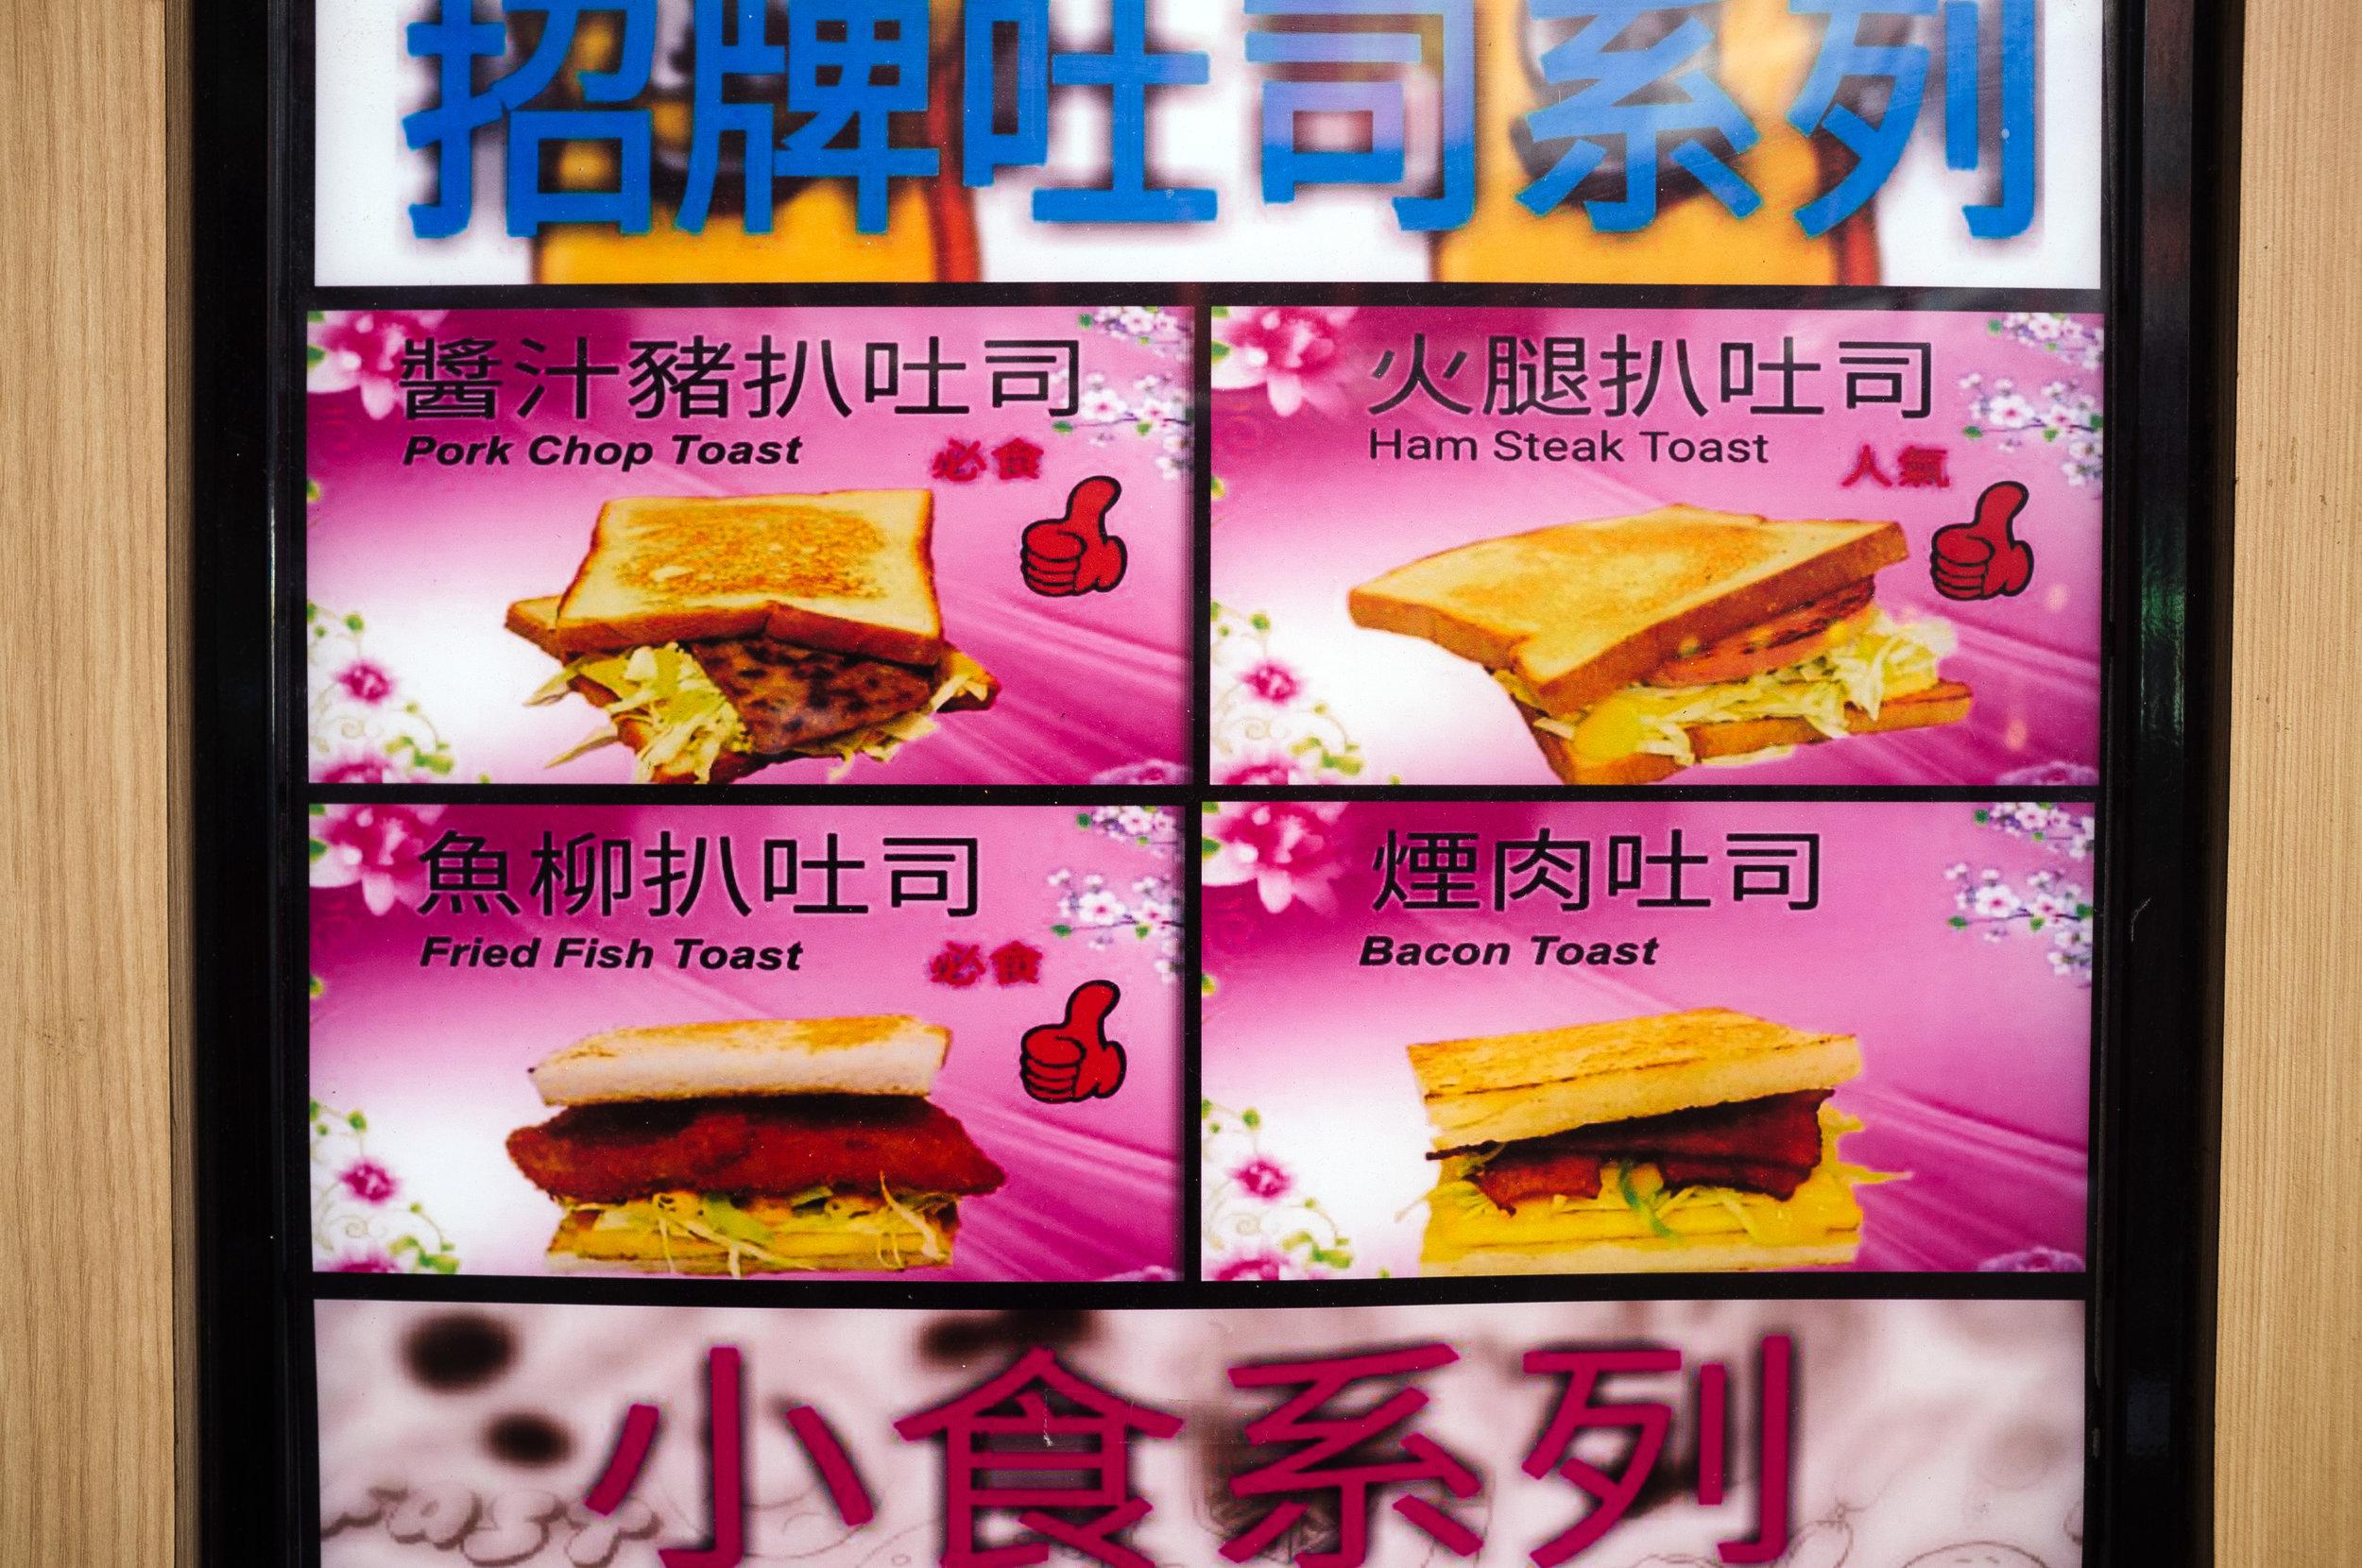 Mong Kok Toast.jpg